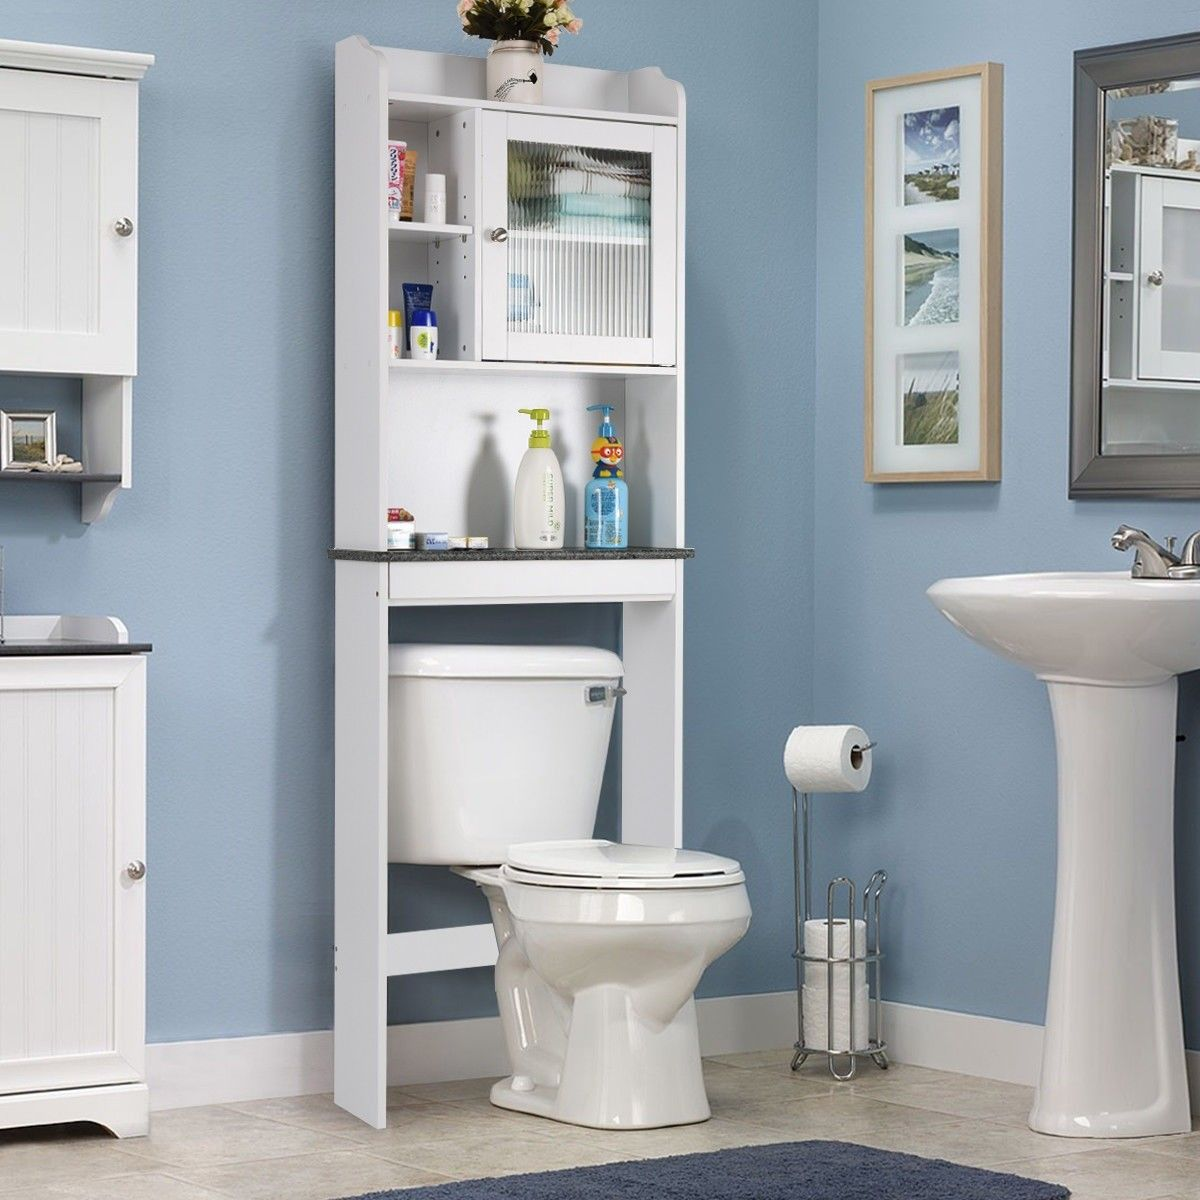 Bathroom Space Saver White Over The Toilet Cabinet Bathroom Space Saver Bathroom Storage Cabinet Space Saving Toilet